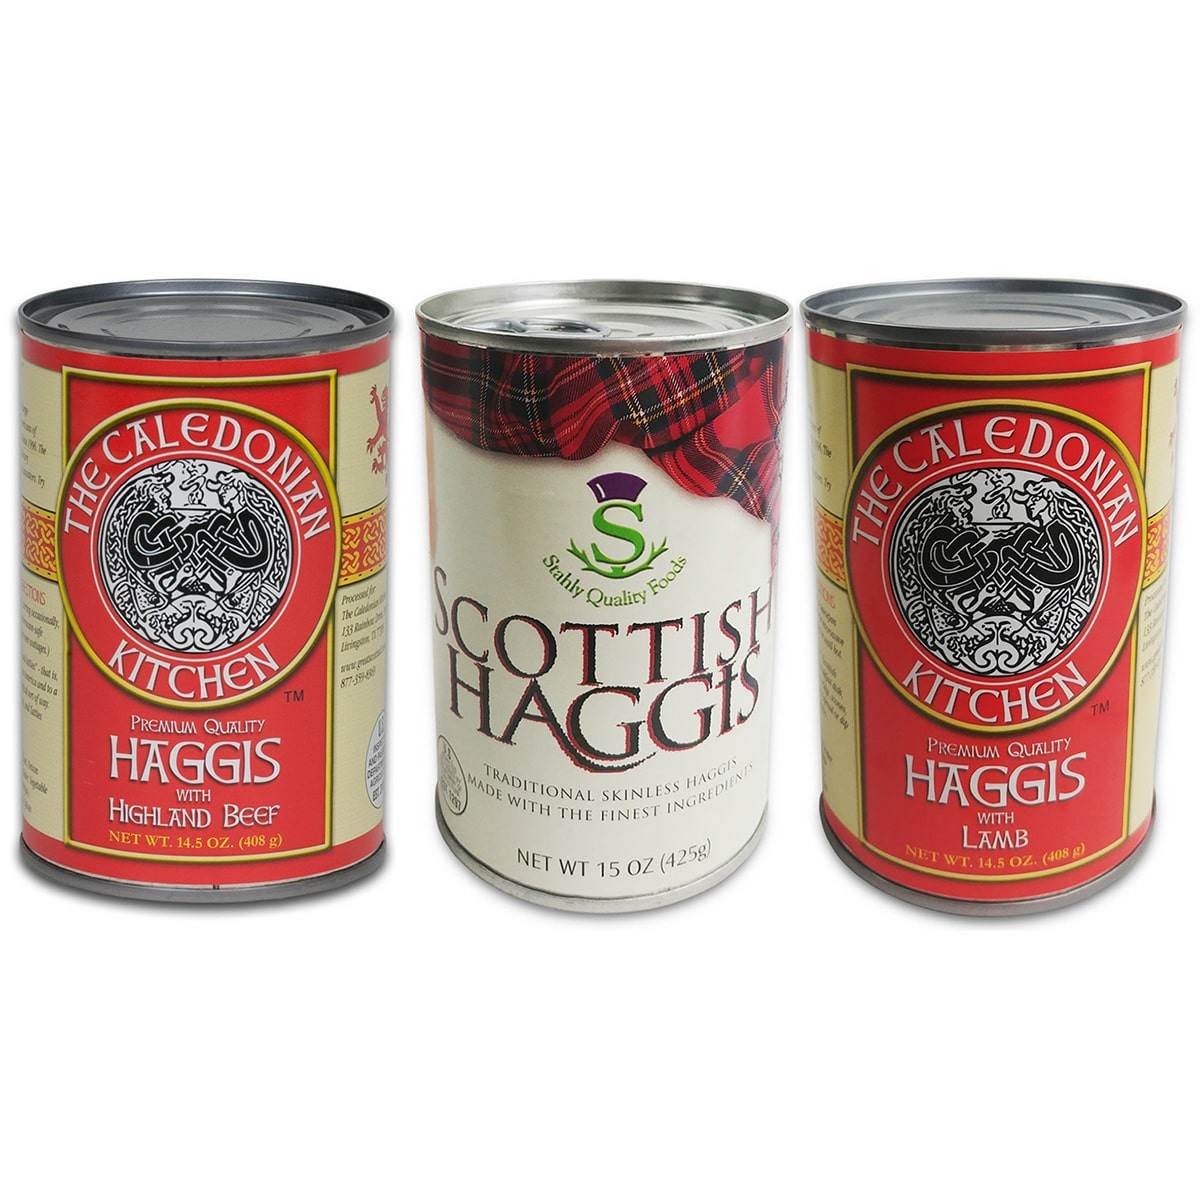 Celtic Croft Haggis Sampler